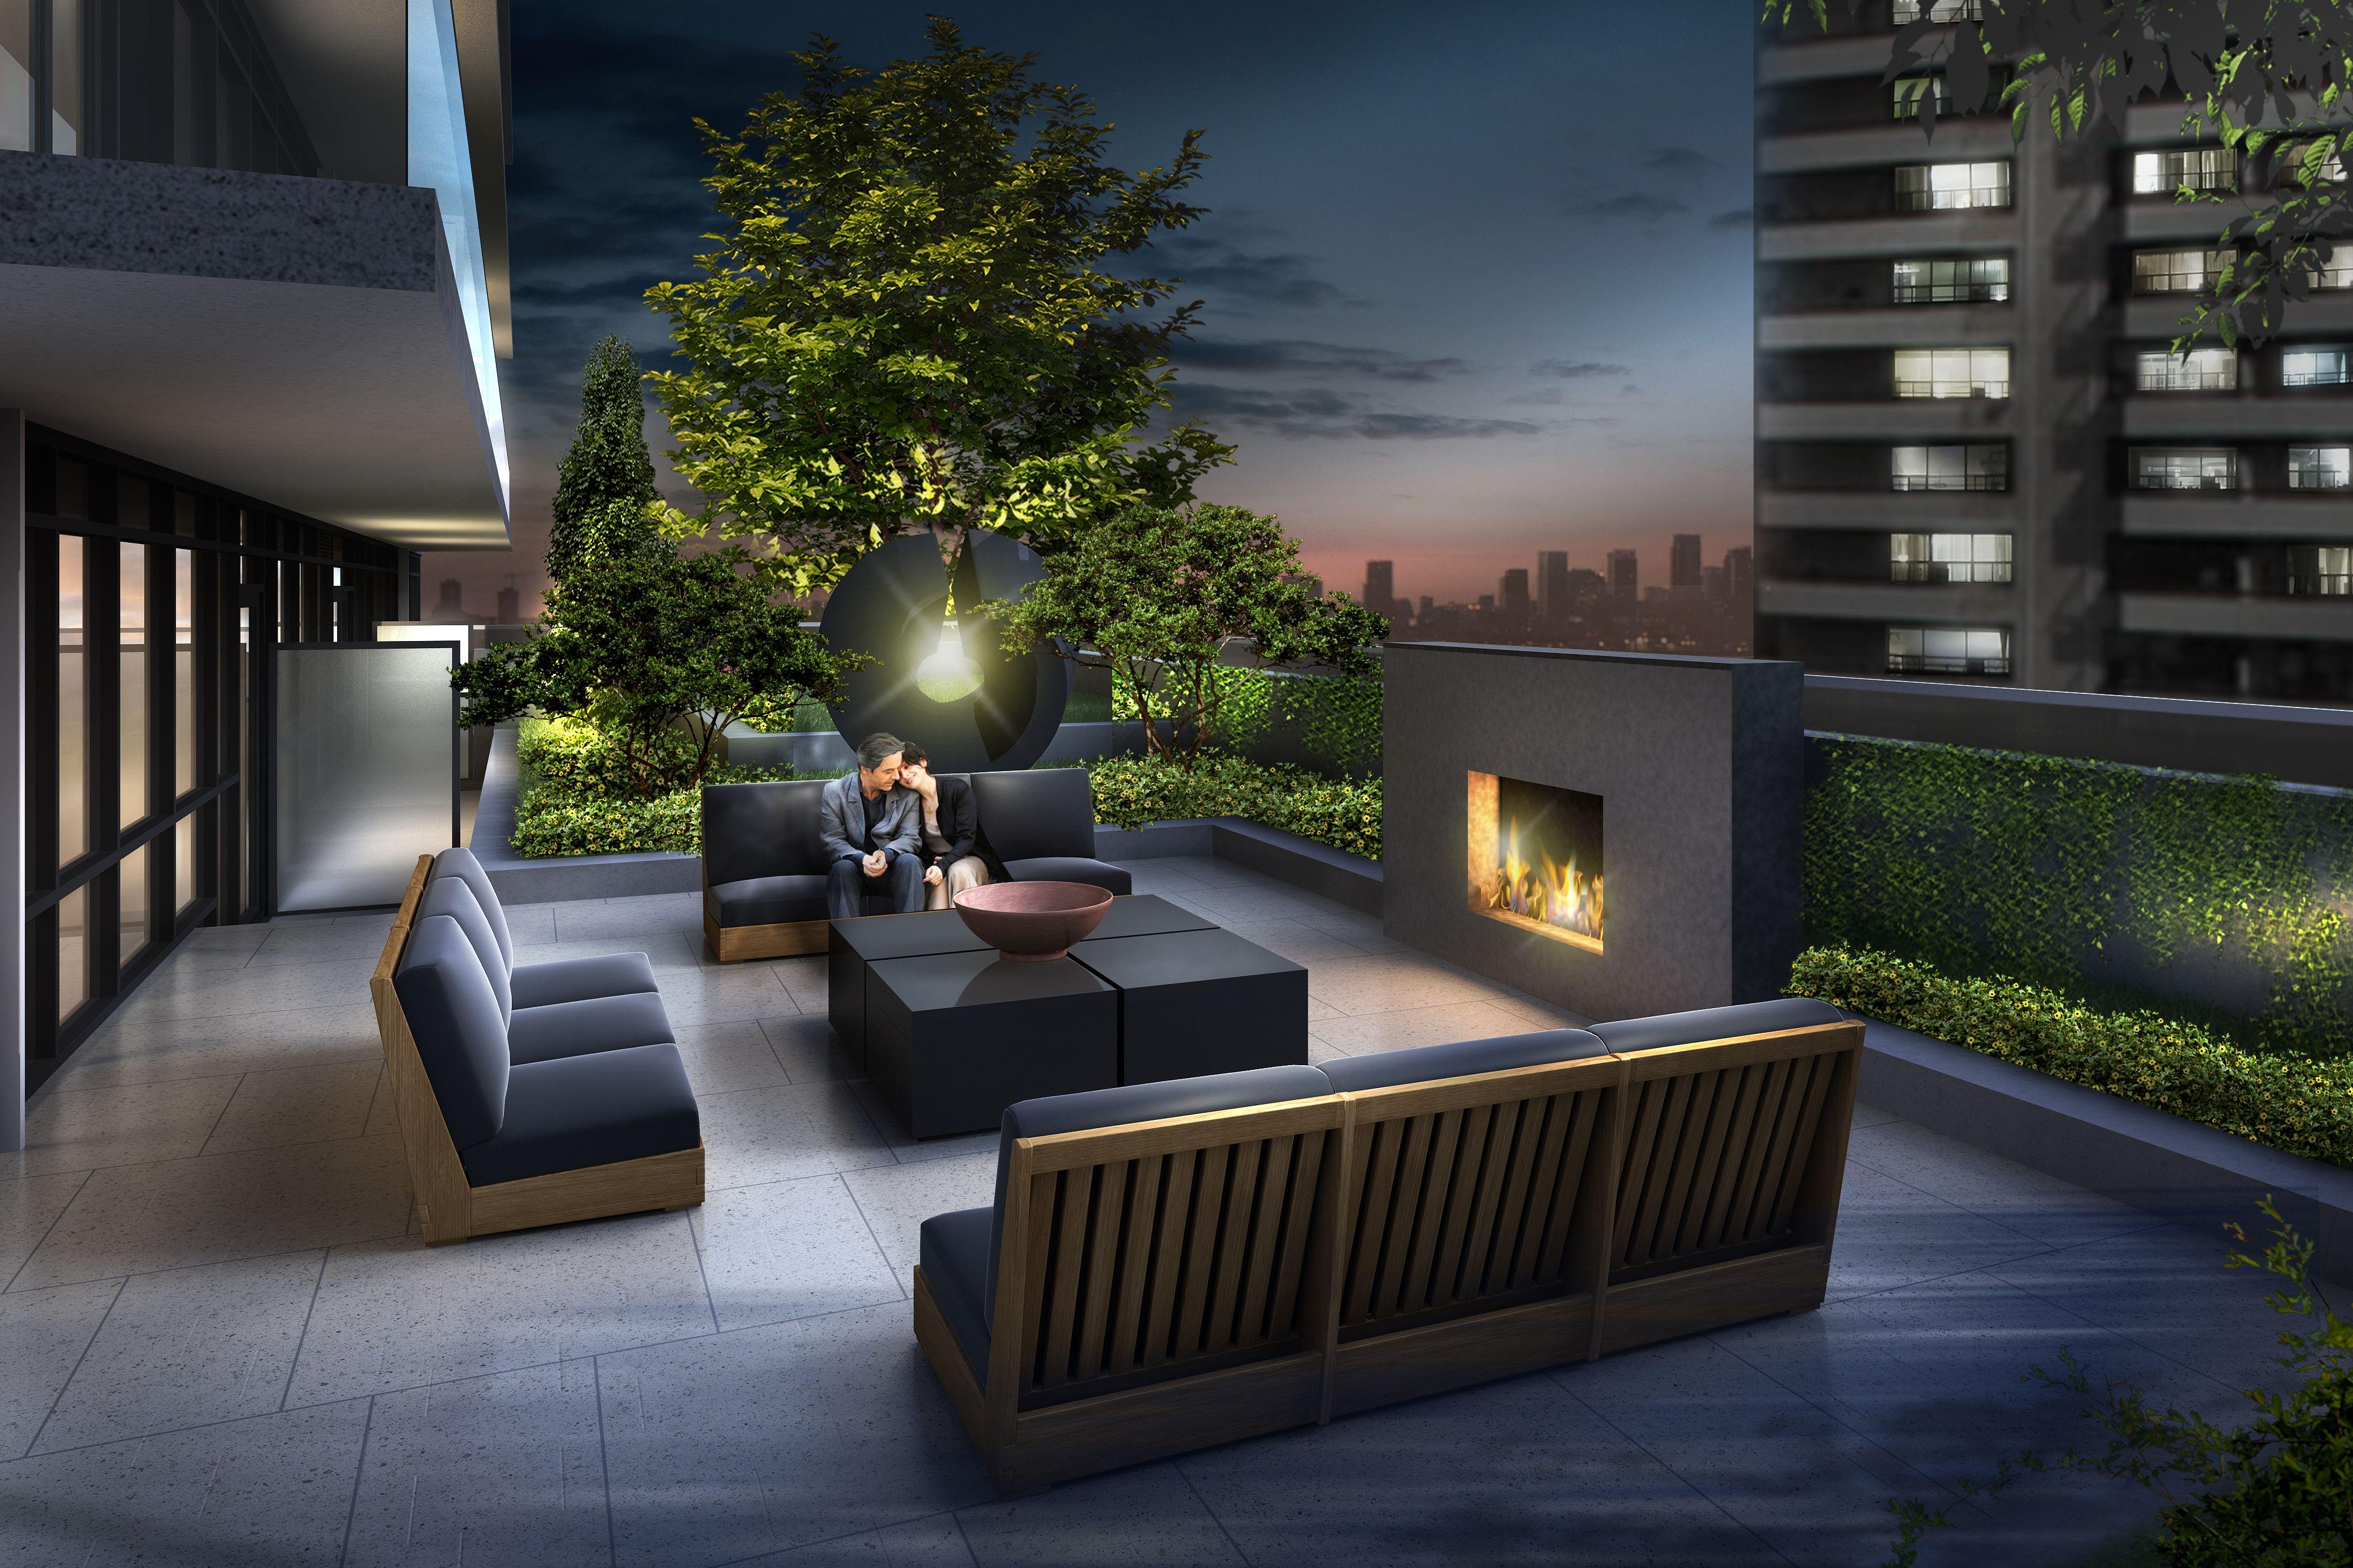 Rooftop Terrace At 101erskine Complete With Fireplace Condolife Torontocondo Yonge Eglinton Alfresco Dining Area Exterior Design Condo